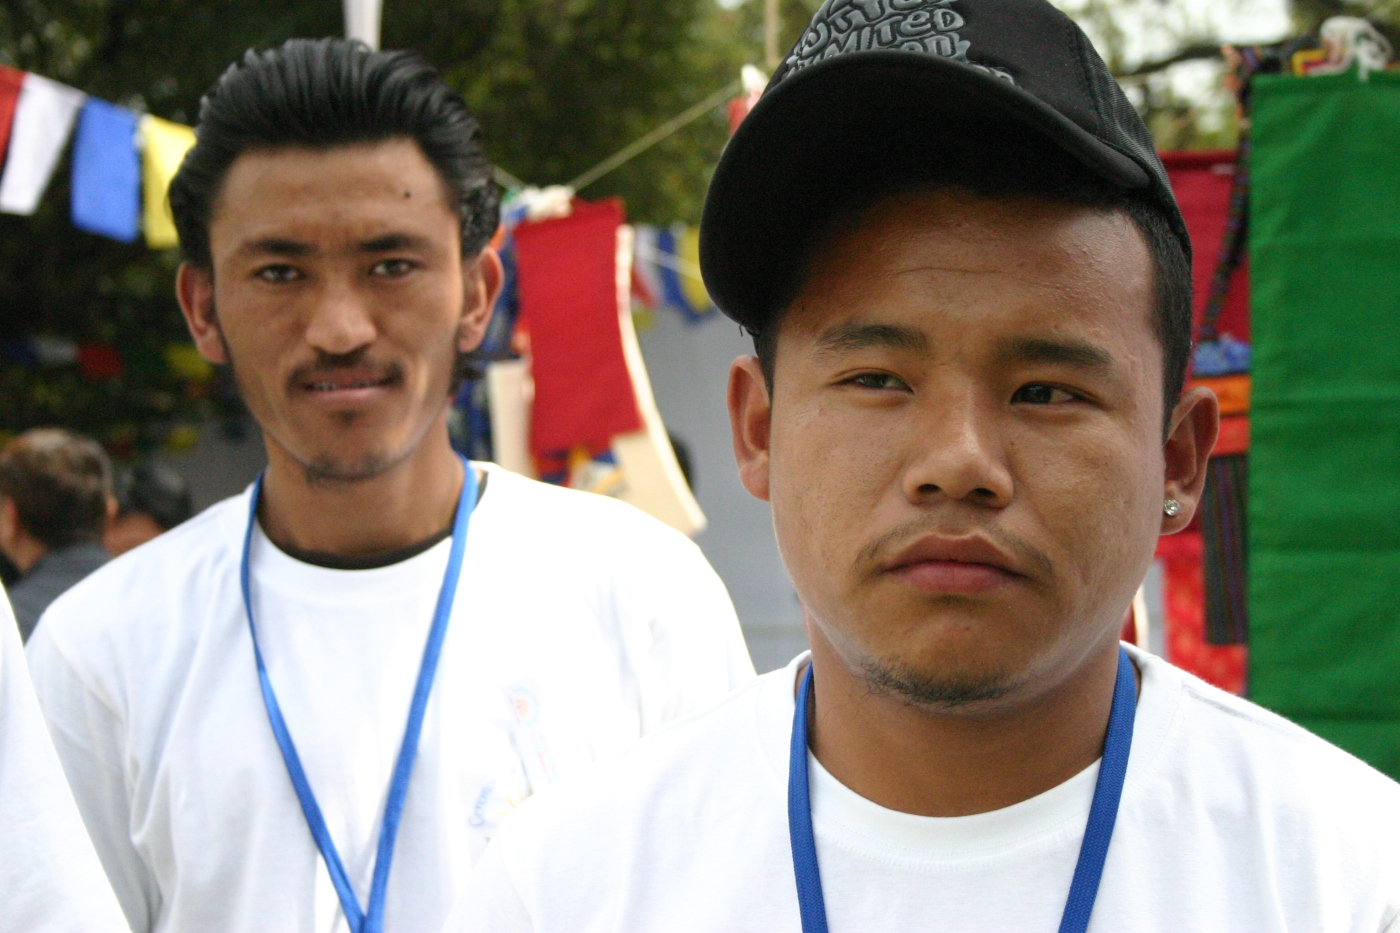 Tibetan youth